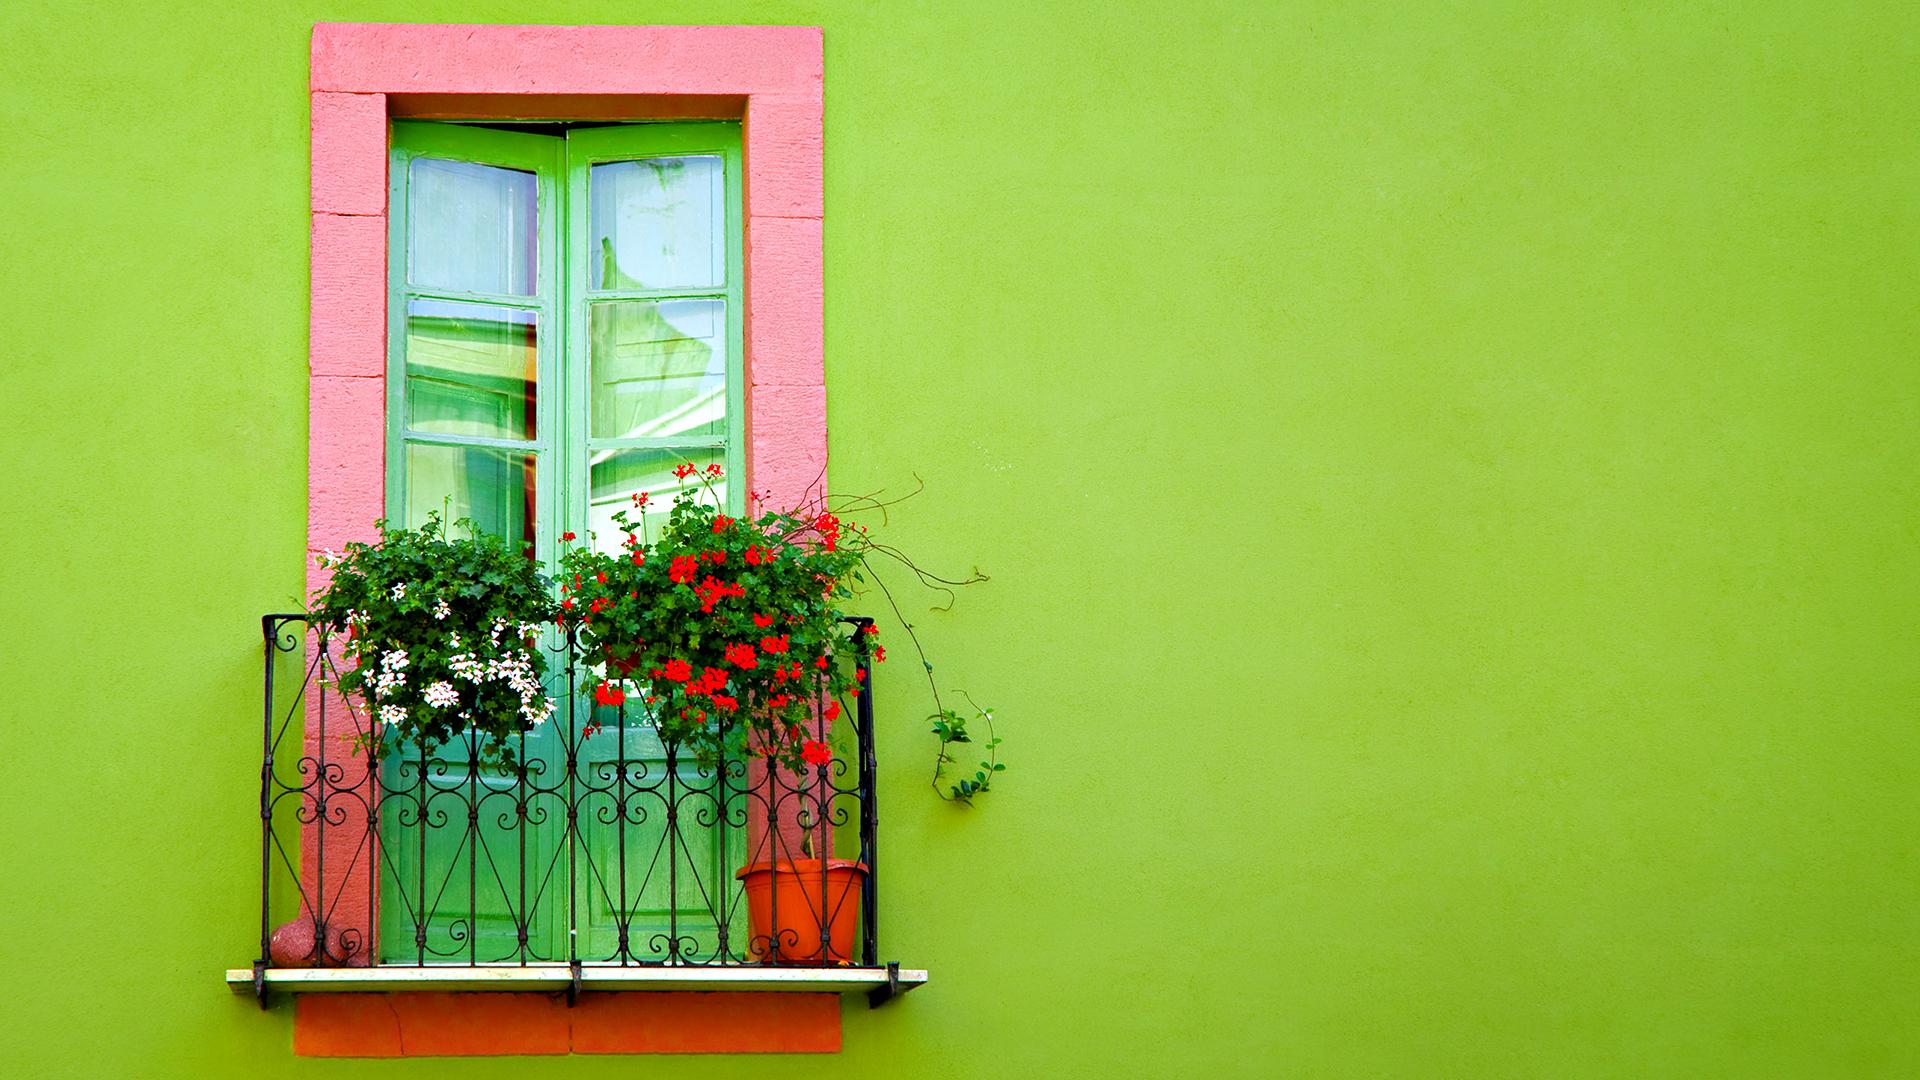 Green Wall Window Wallpapers HD Wallpapers 1920x1080